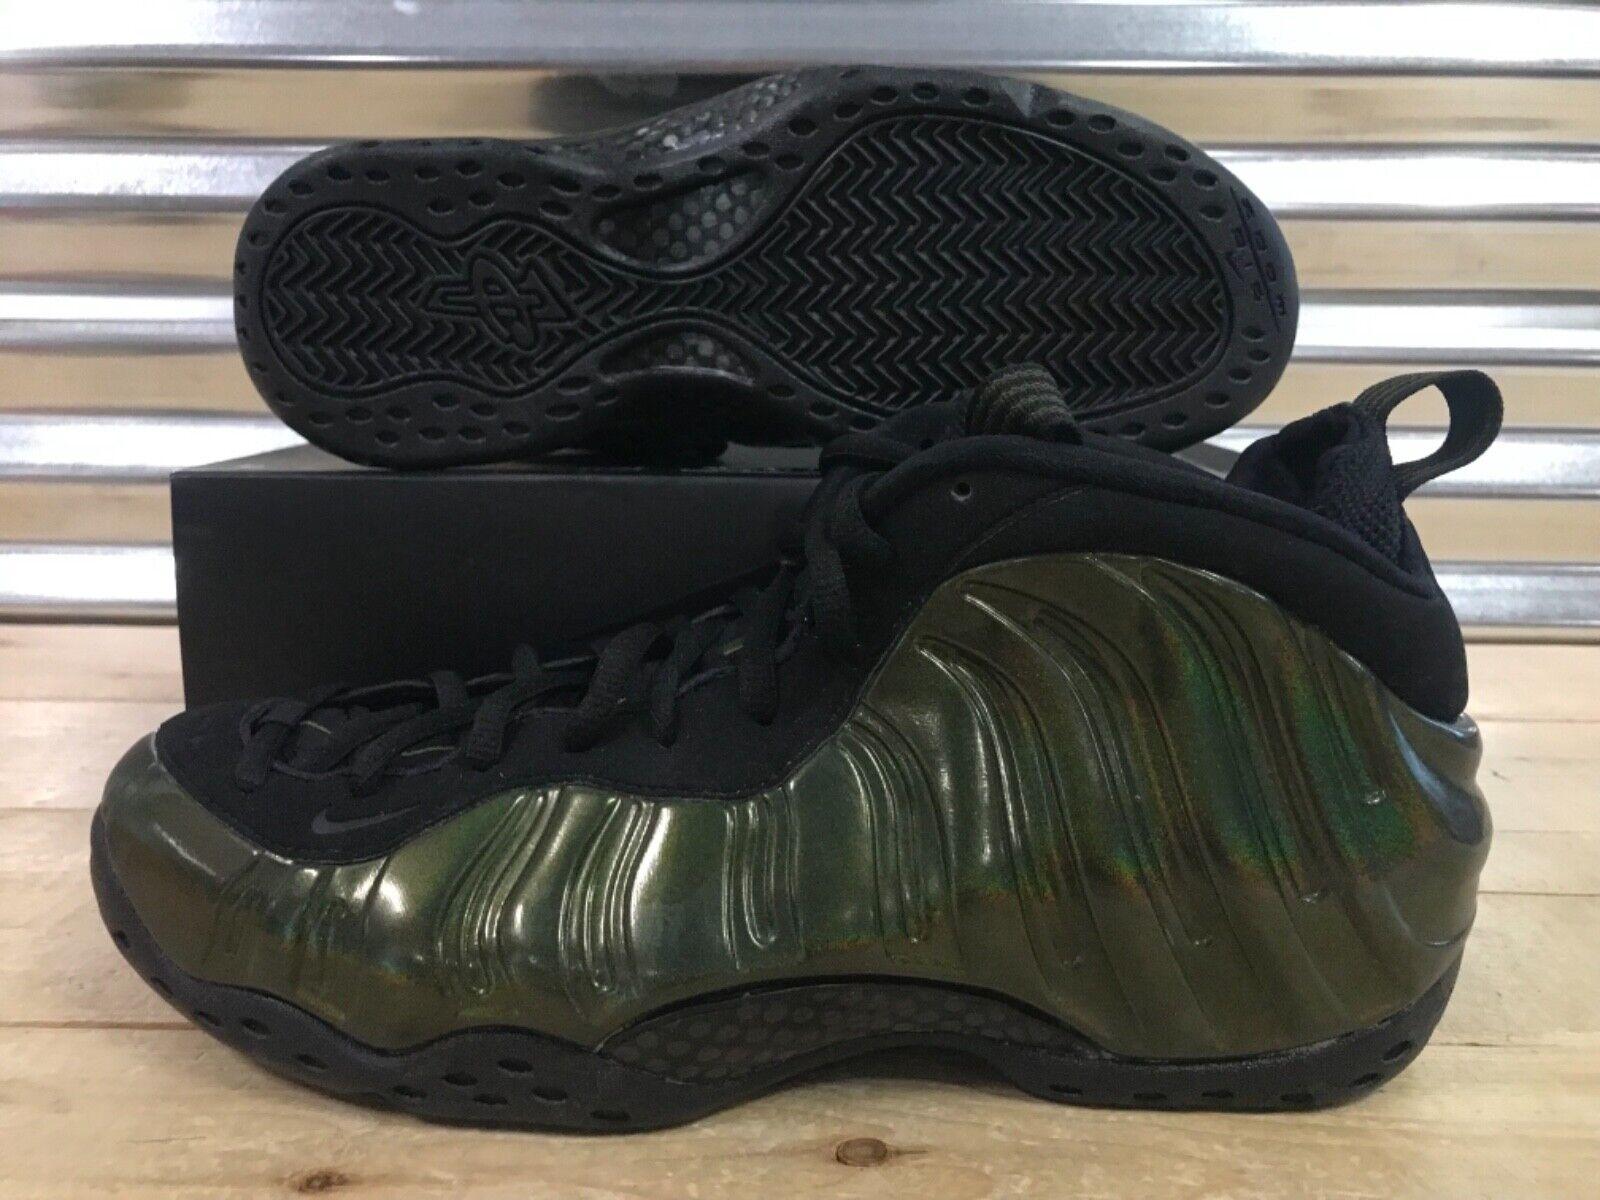 Nike Air Foamposite One Basketball shoes Legion Green Black SZ ( 314996-301 )